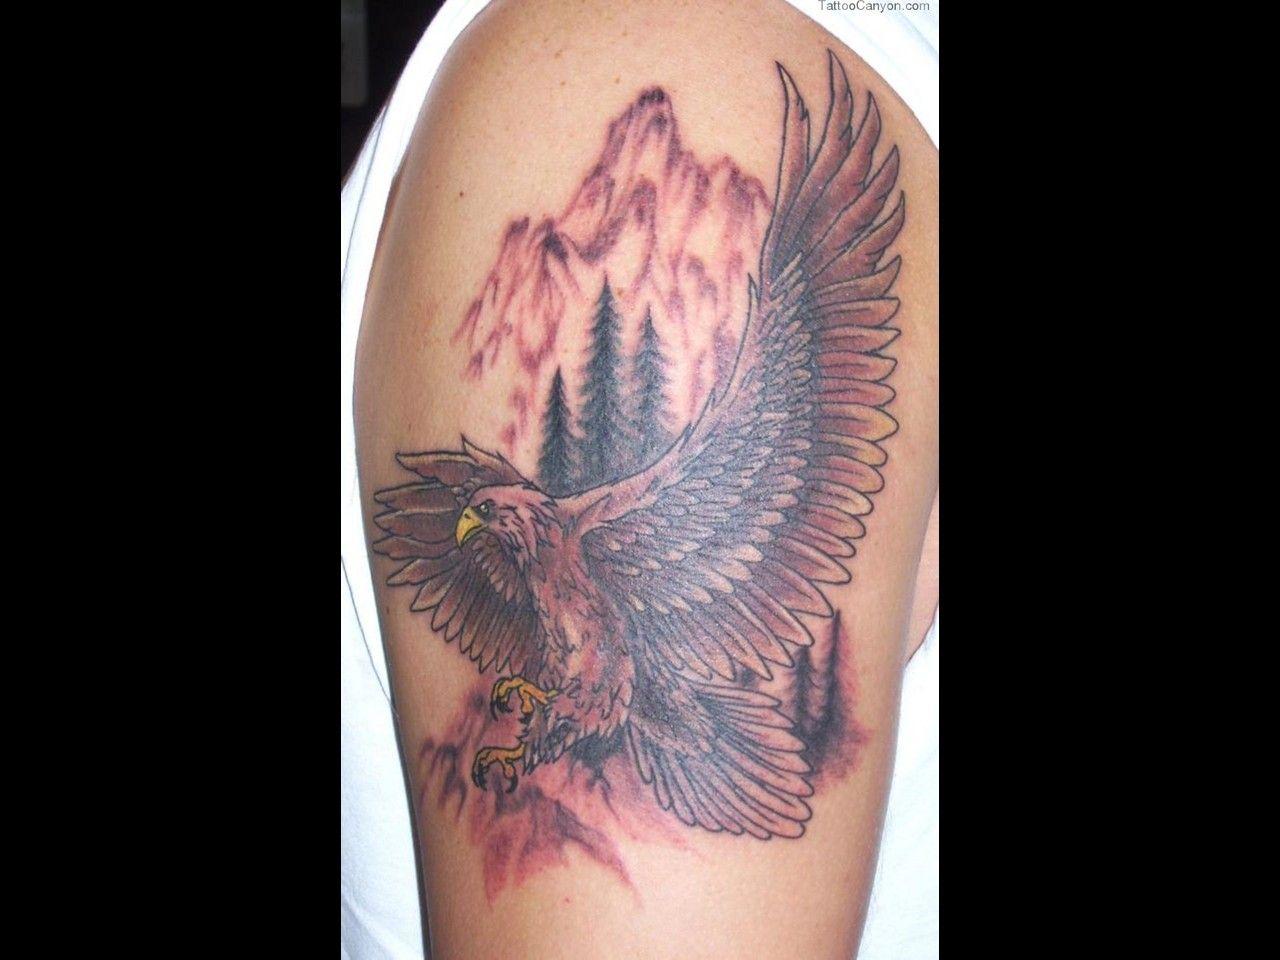 Iron eagle tattoo 25 brilliant cross tattoos for men - Tattoo